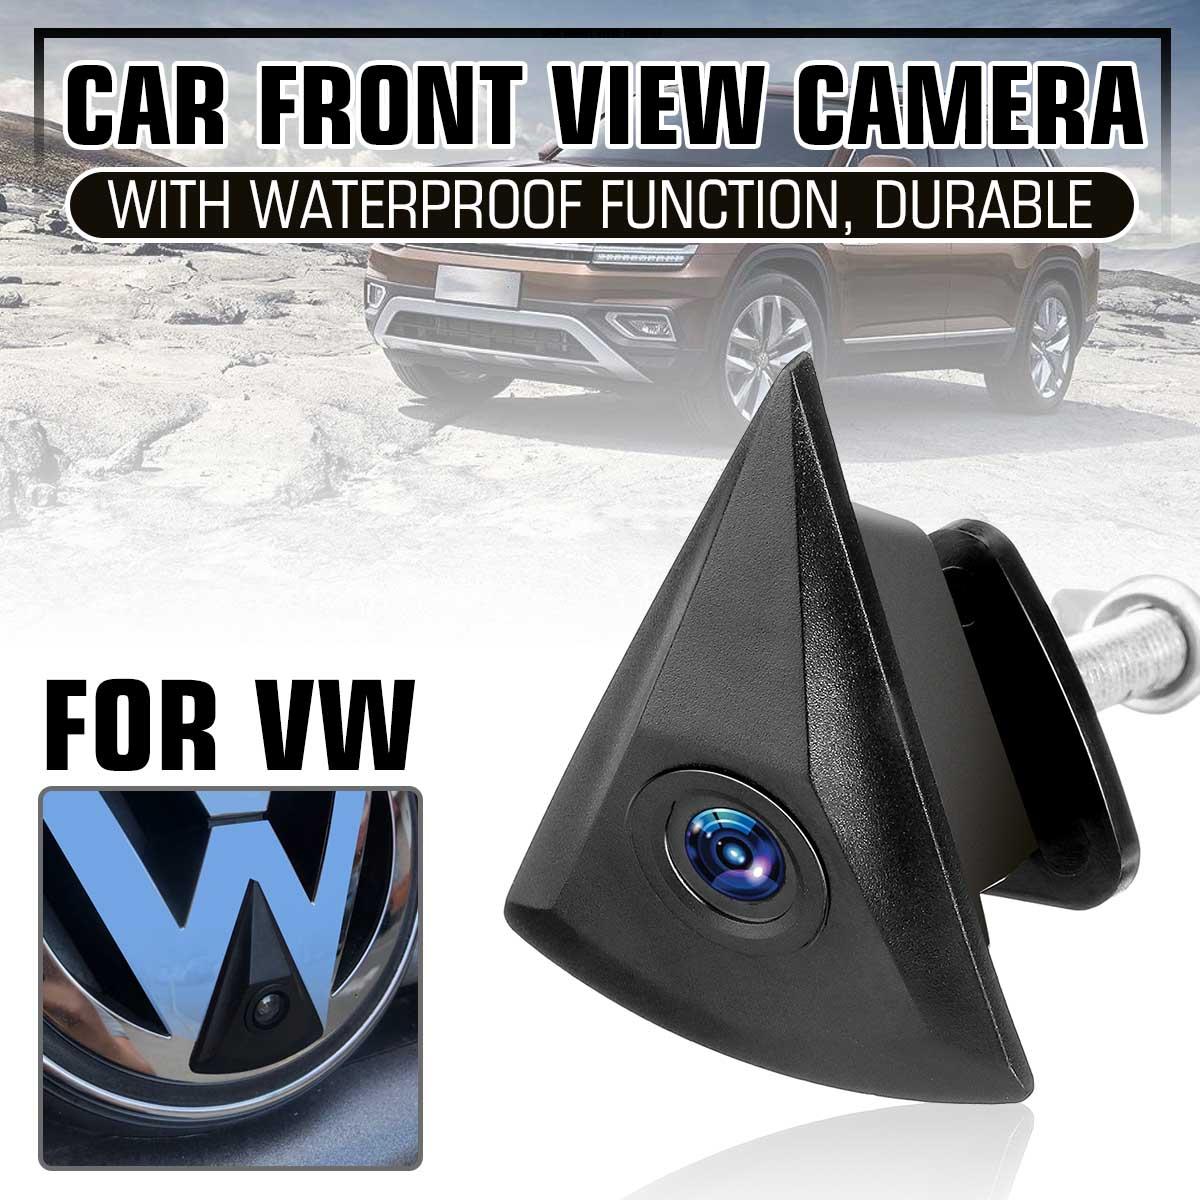 CCD HD Car Front View Camera Logo Waterproof 170 Degree For VW Volkswagen GOLF Jetta Touareg Passat Polo Tiguan Bora